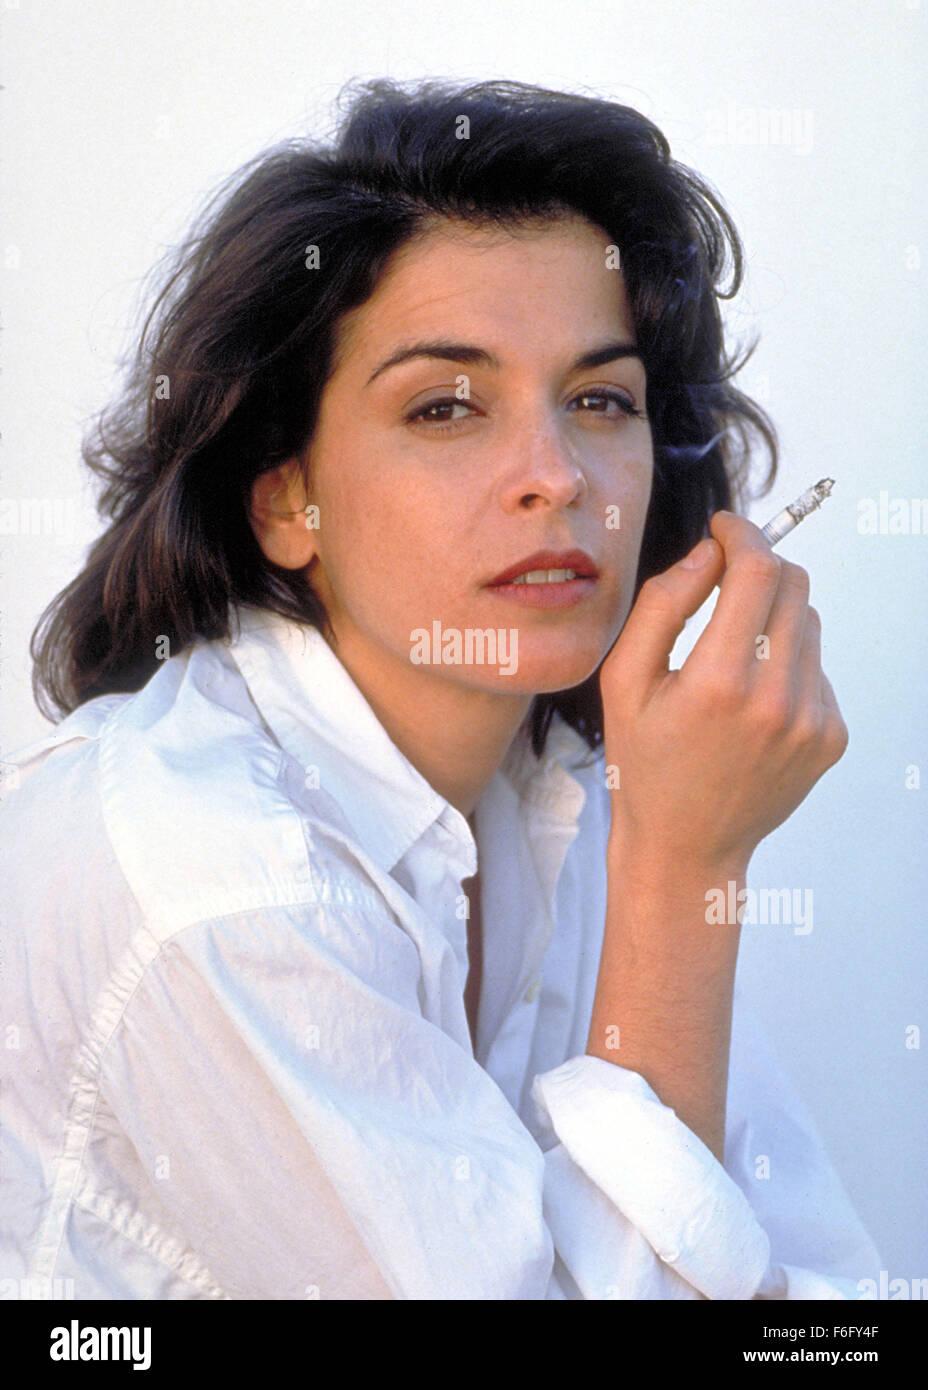 feb 04 1994 new york ny usa actress annabella sciorra